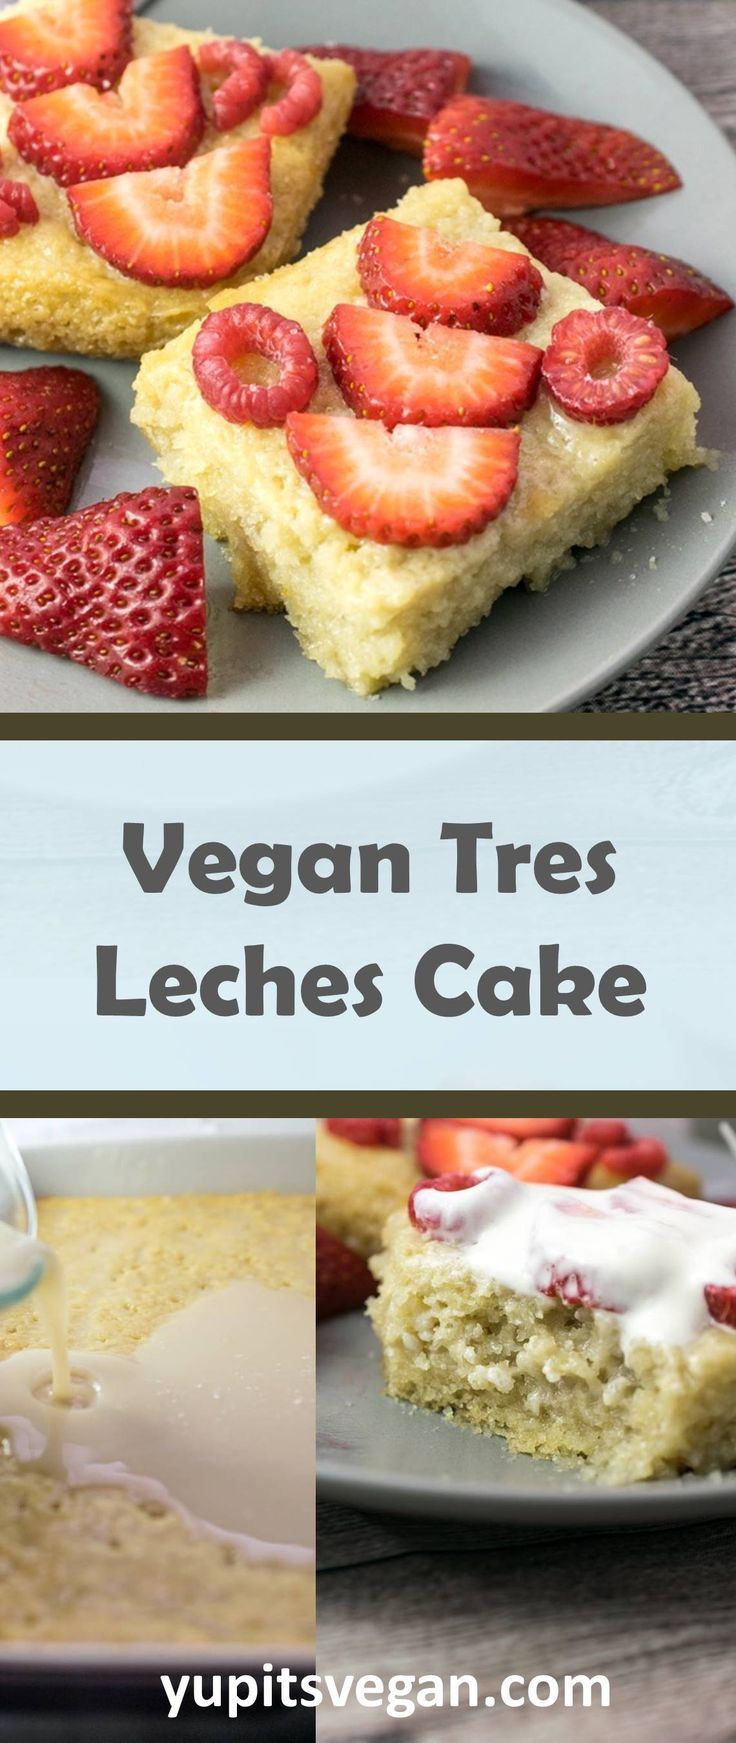 Vegan Tres Leches Cake Yup It S Vegan Fluffy Vegan